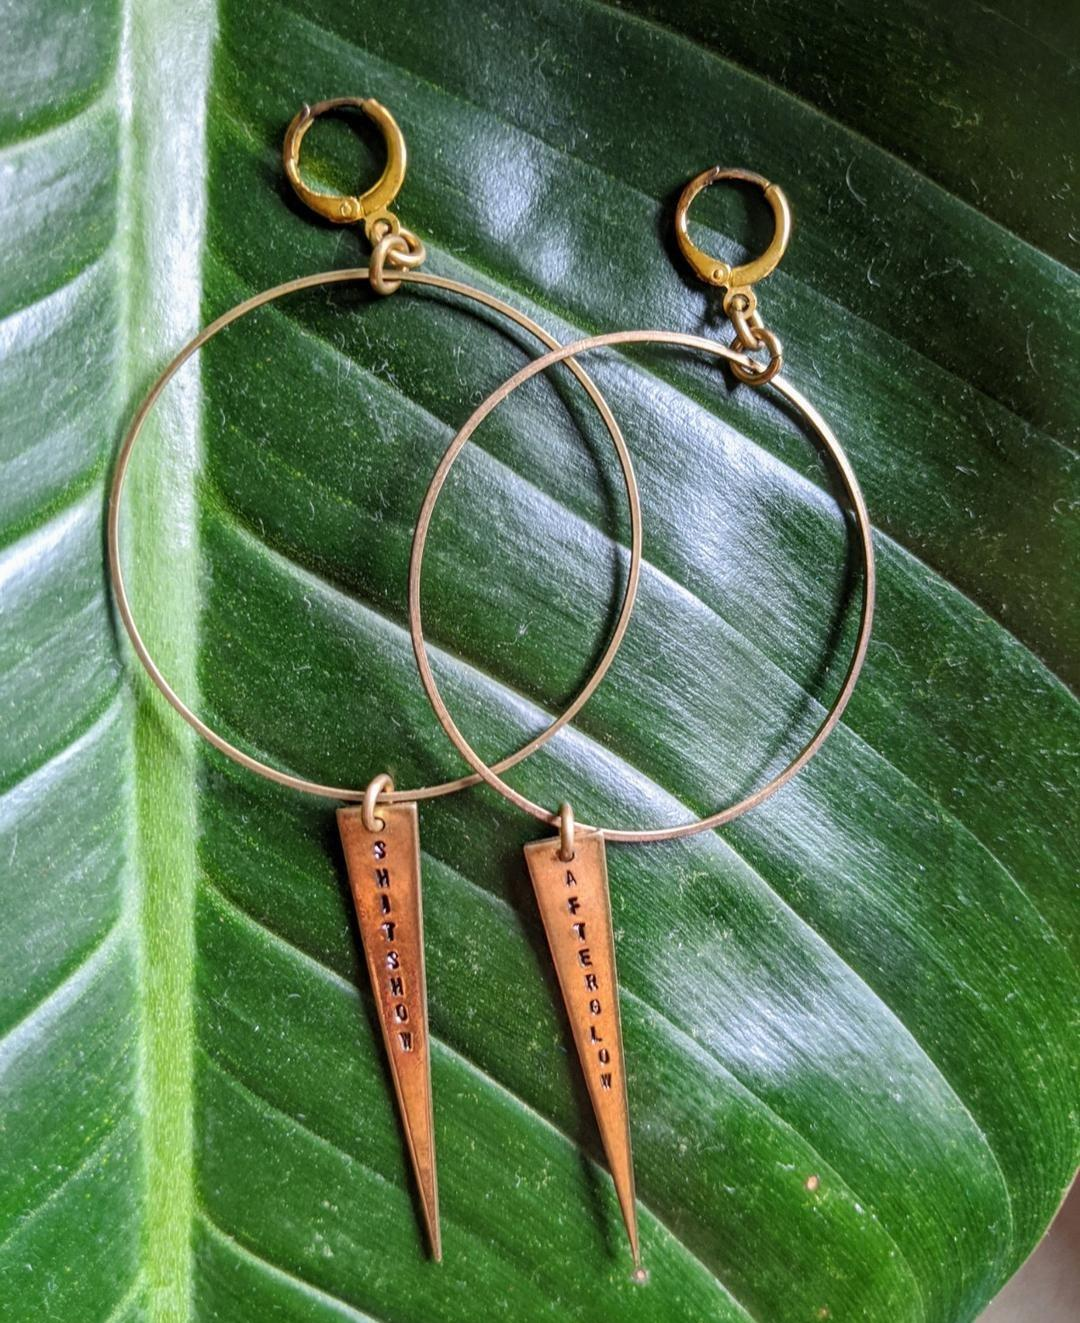 SHITSHOW/AFTERGLOW earrings